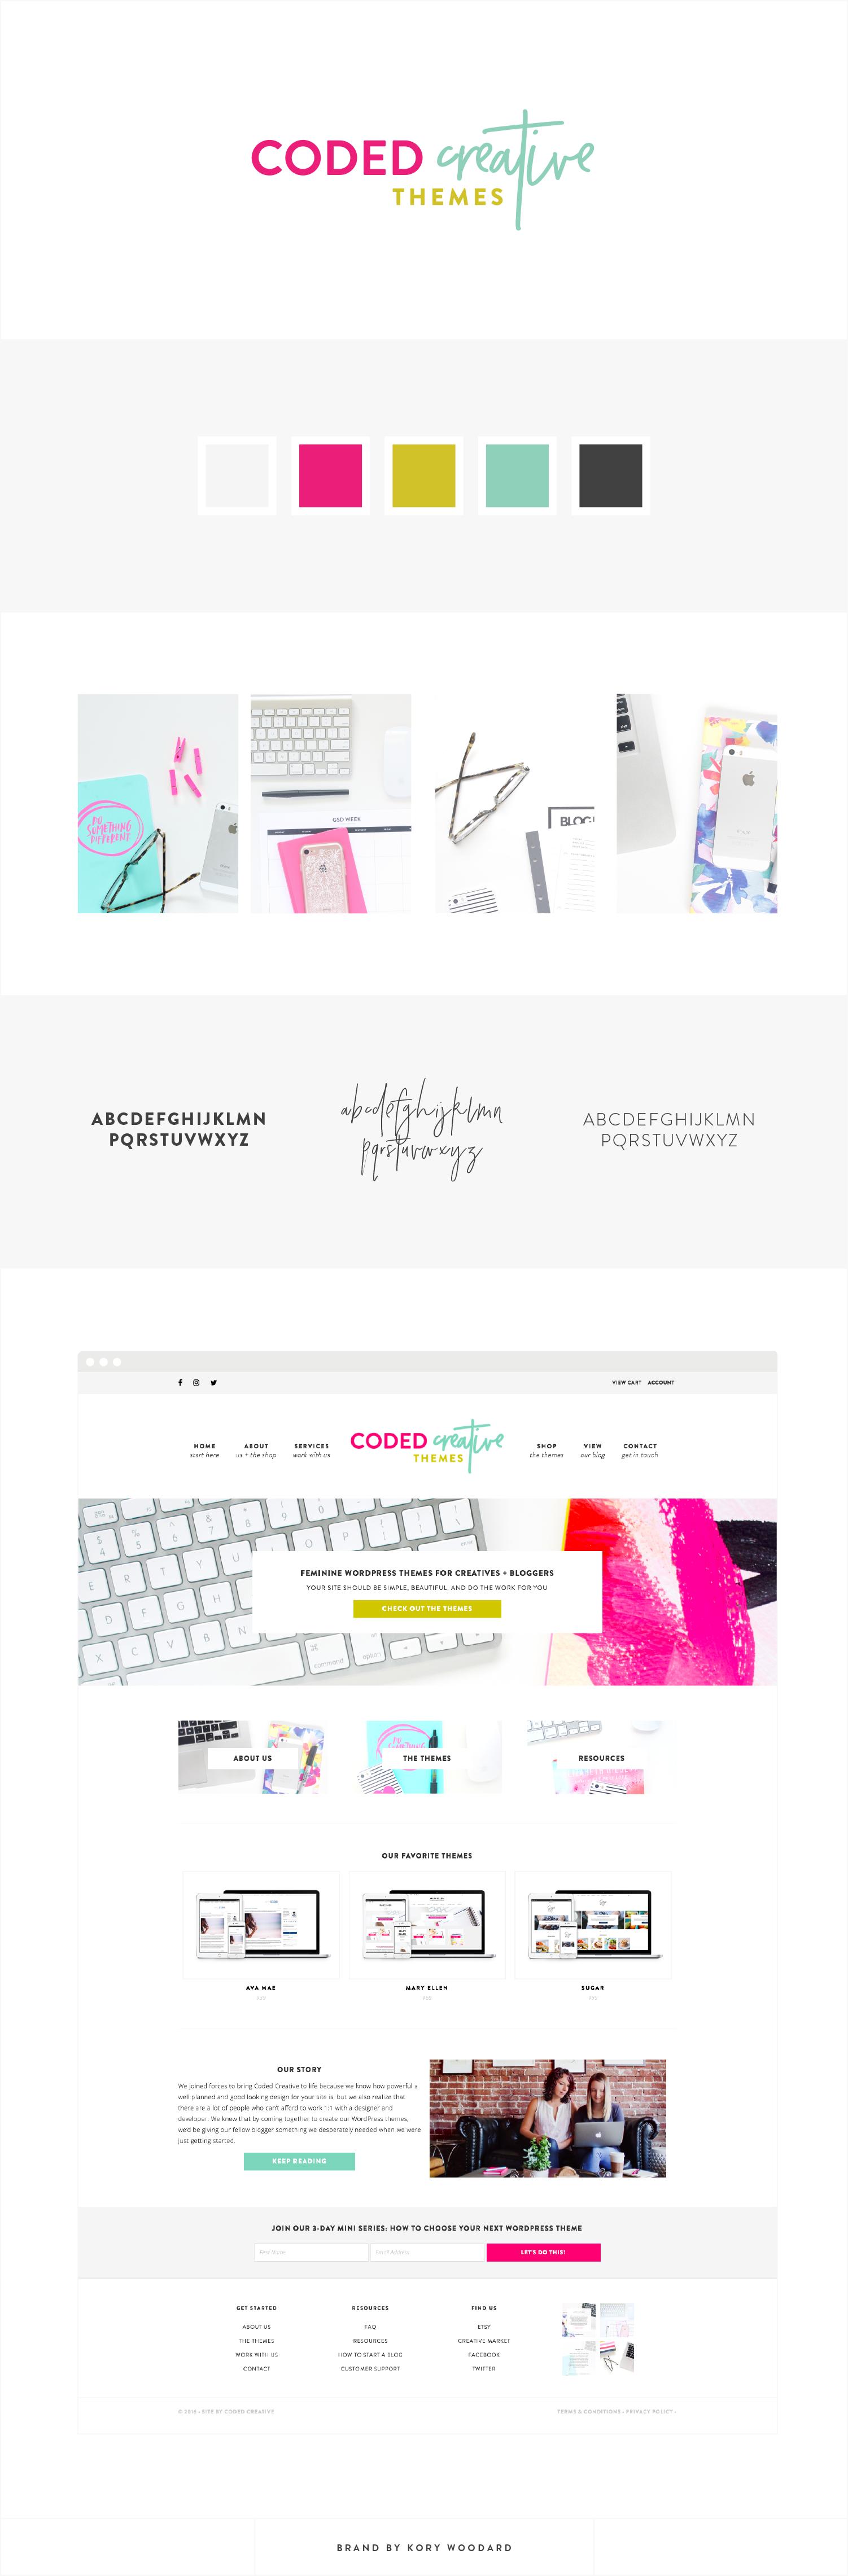 Coded Creative - Branding + Website Design by Kory Woodard